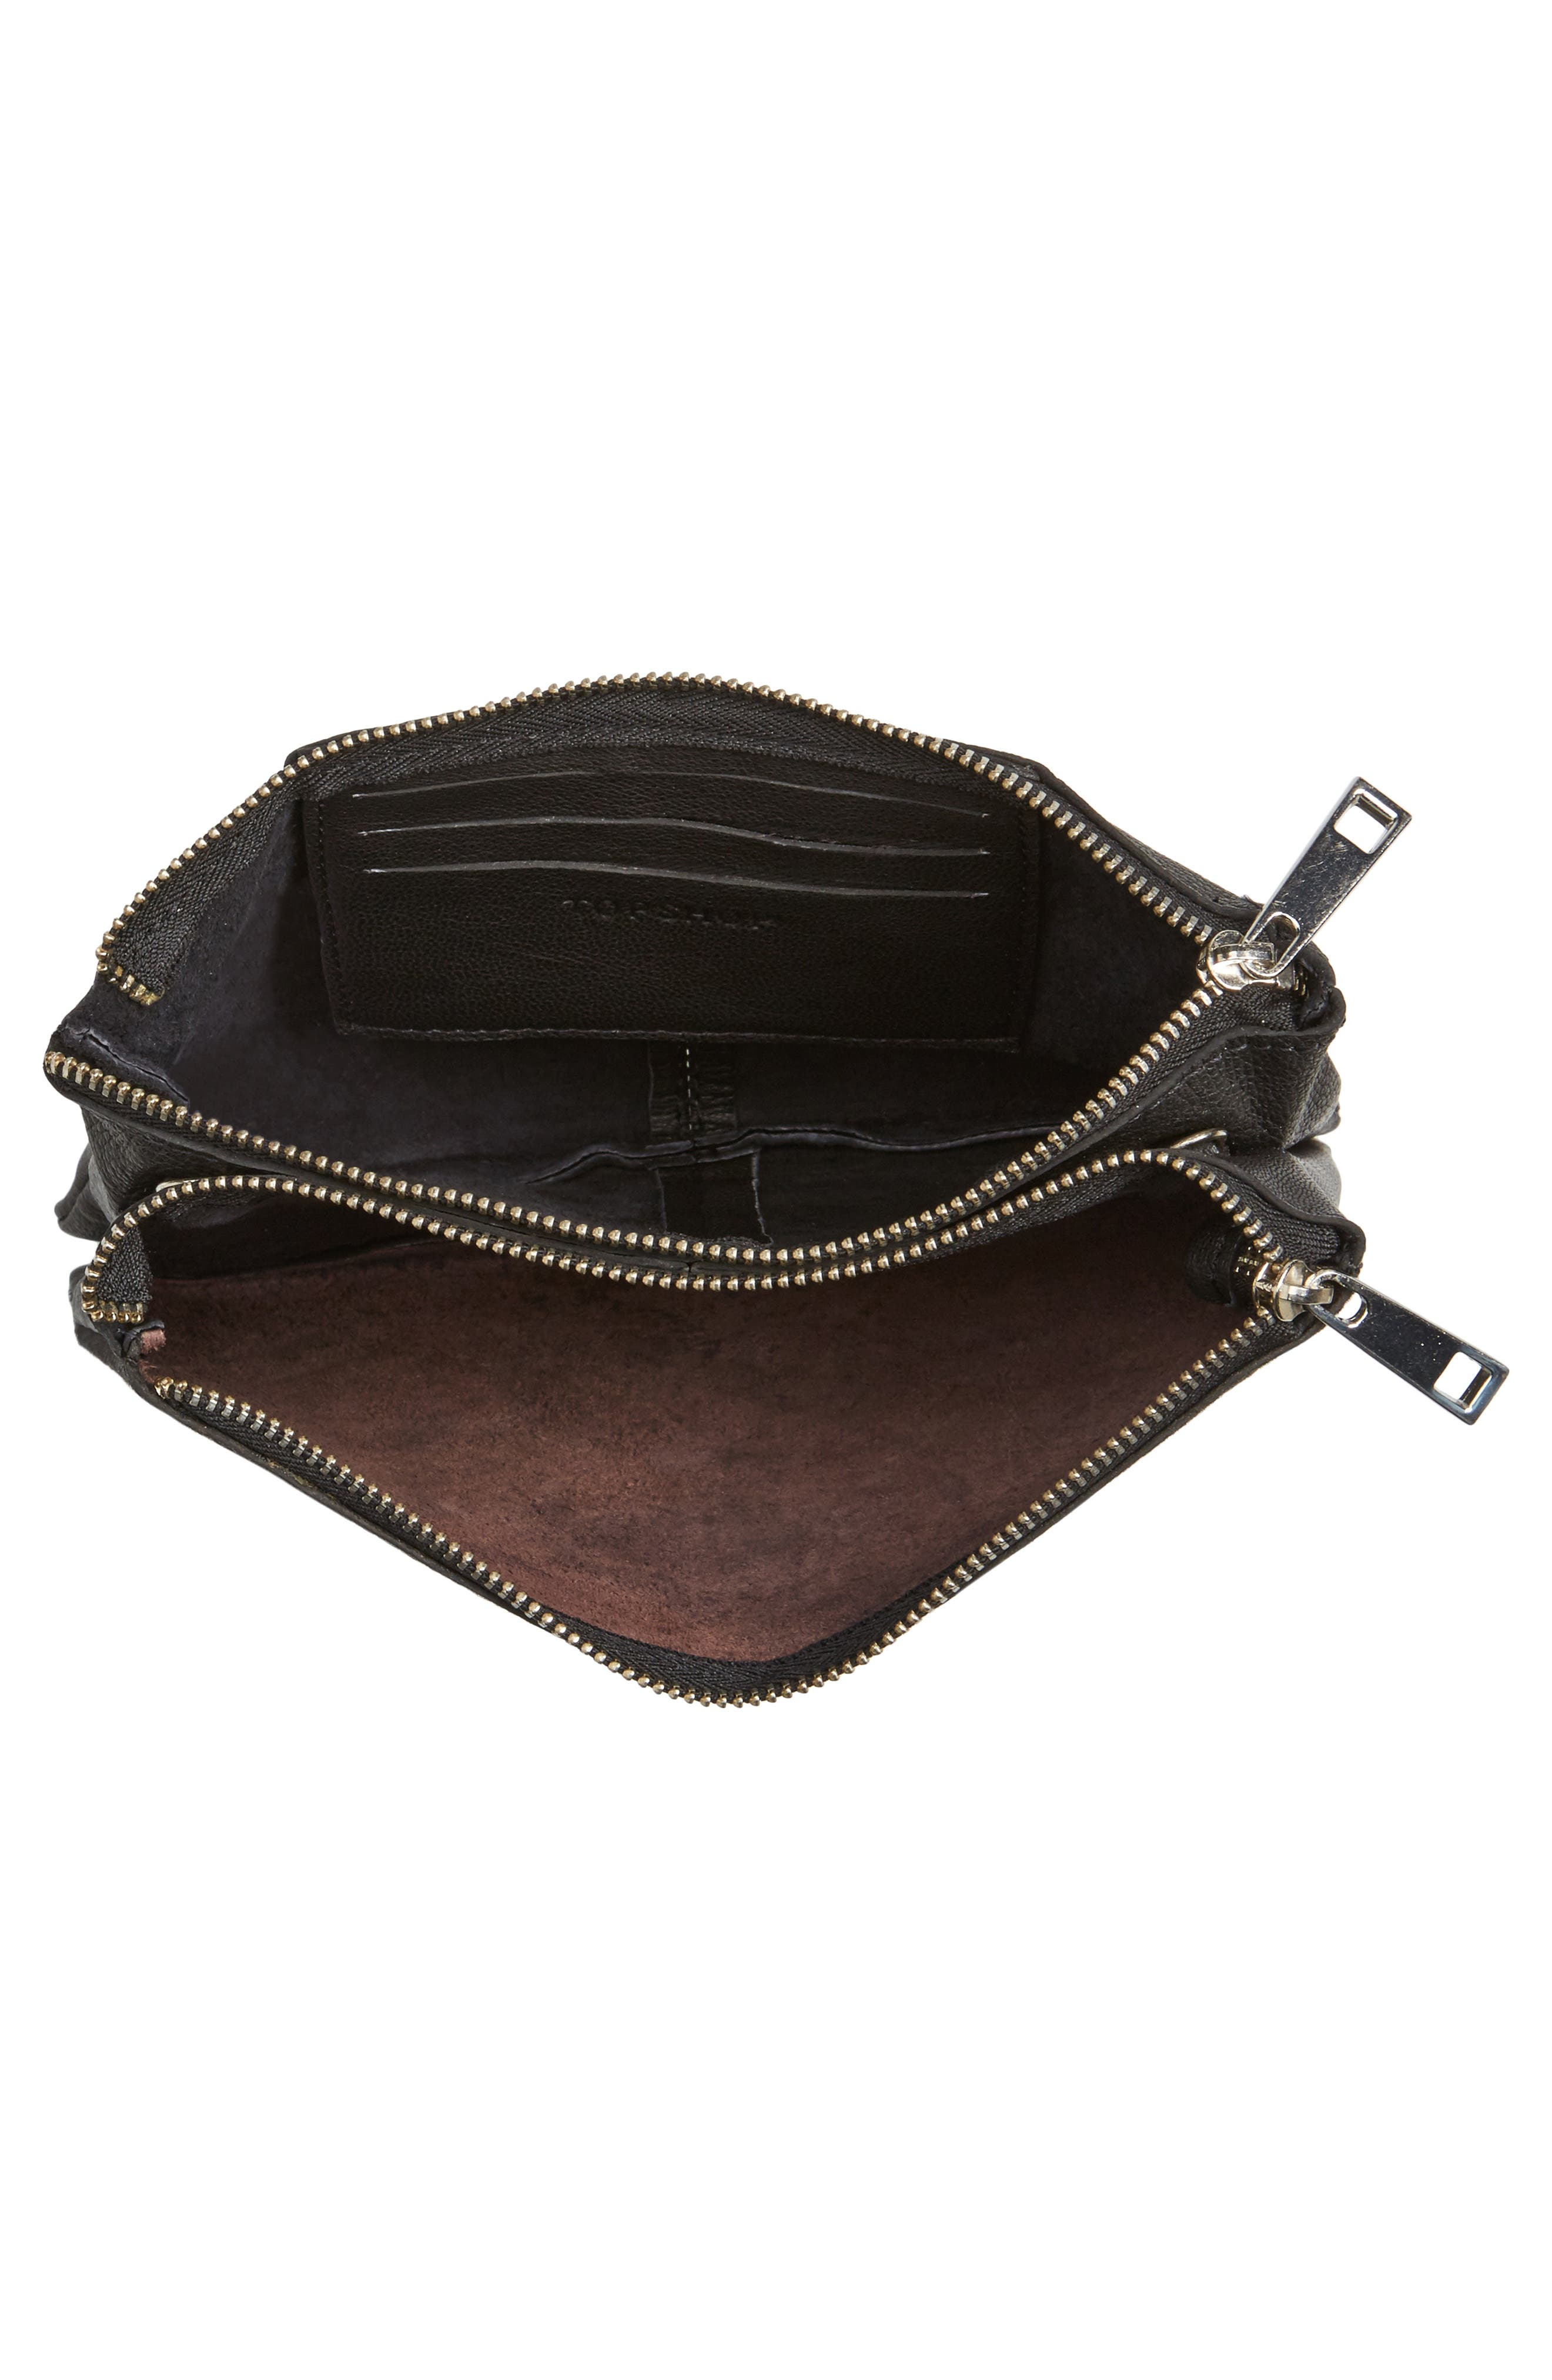 Oakley Leather & Genuine Calf Hair Crossbody Bag,                             Alternate thumbnail 4, color,                             001